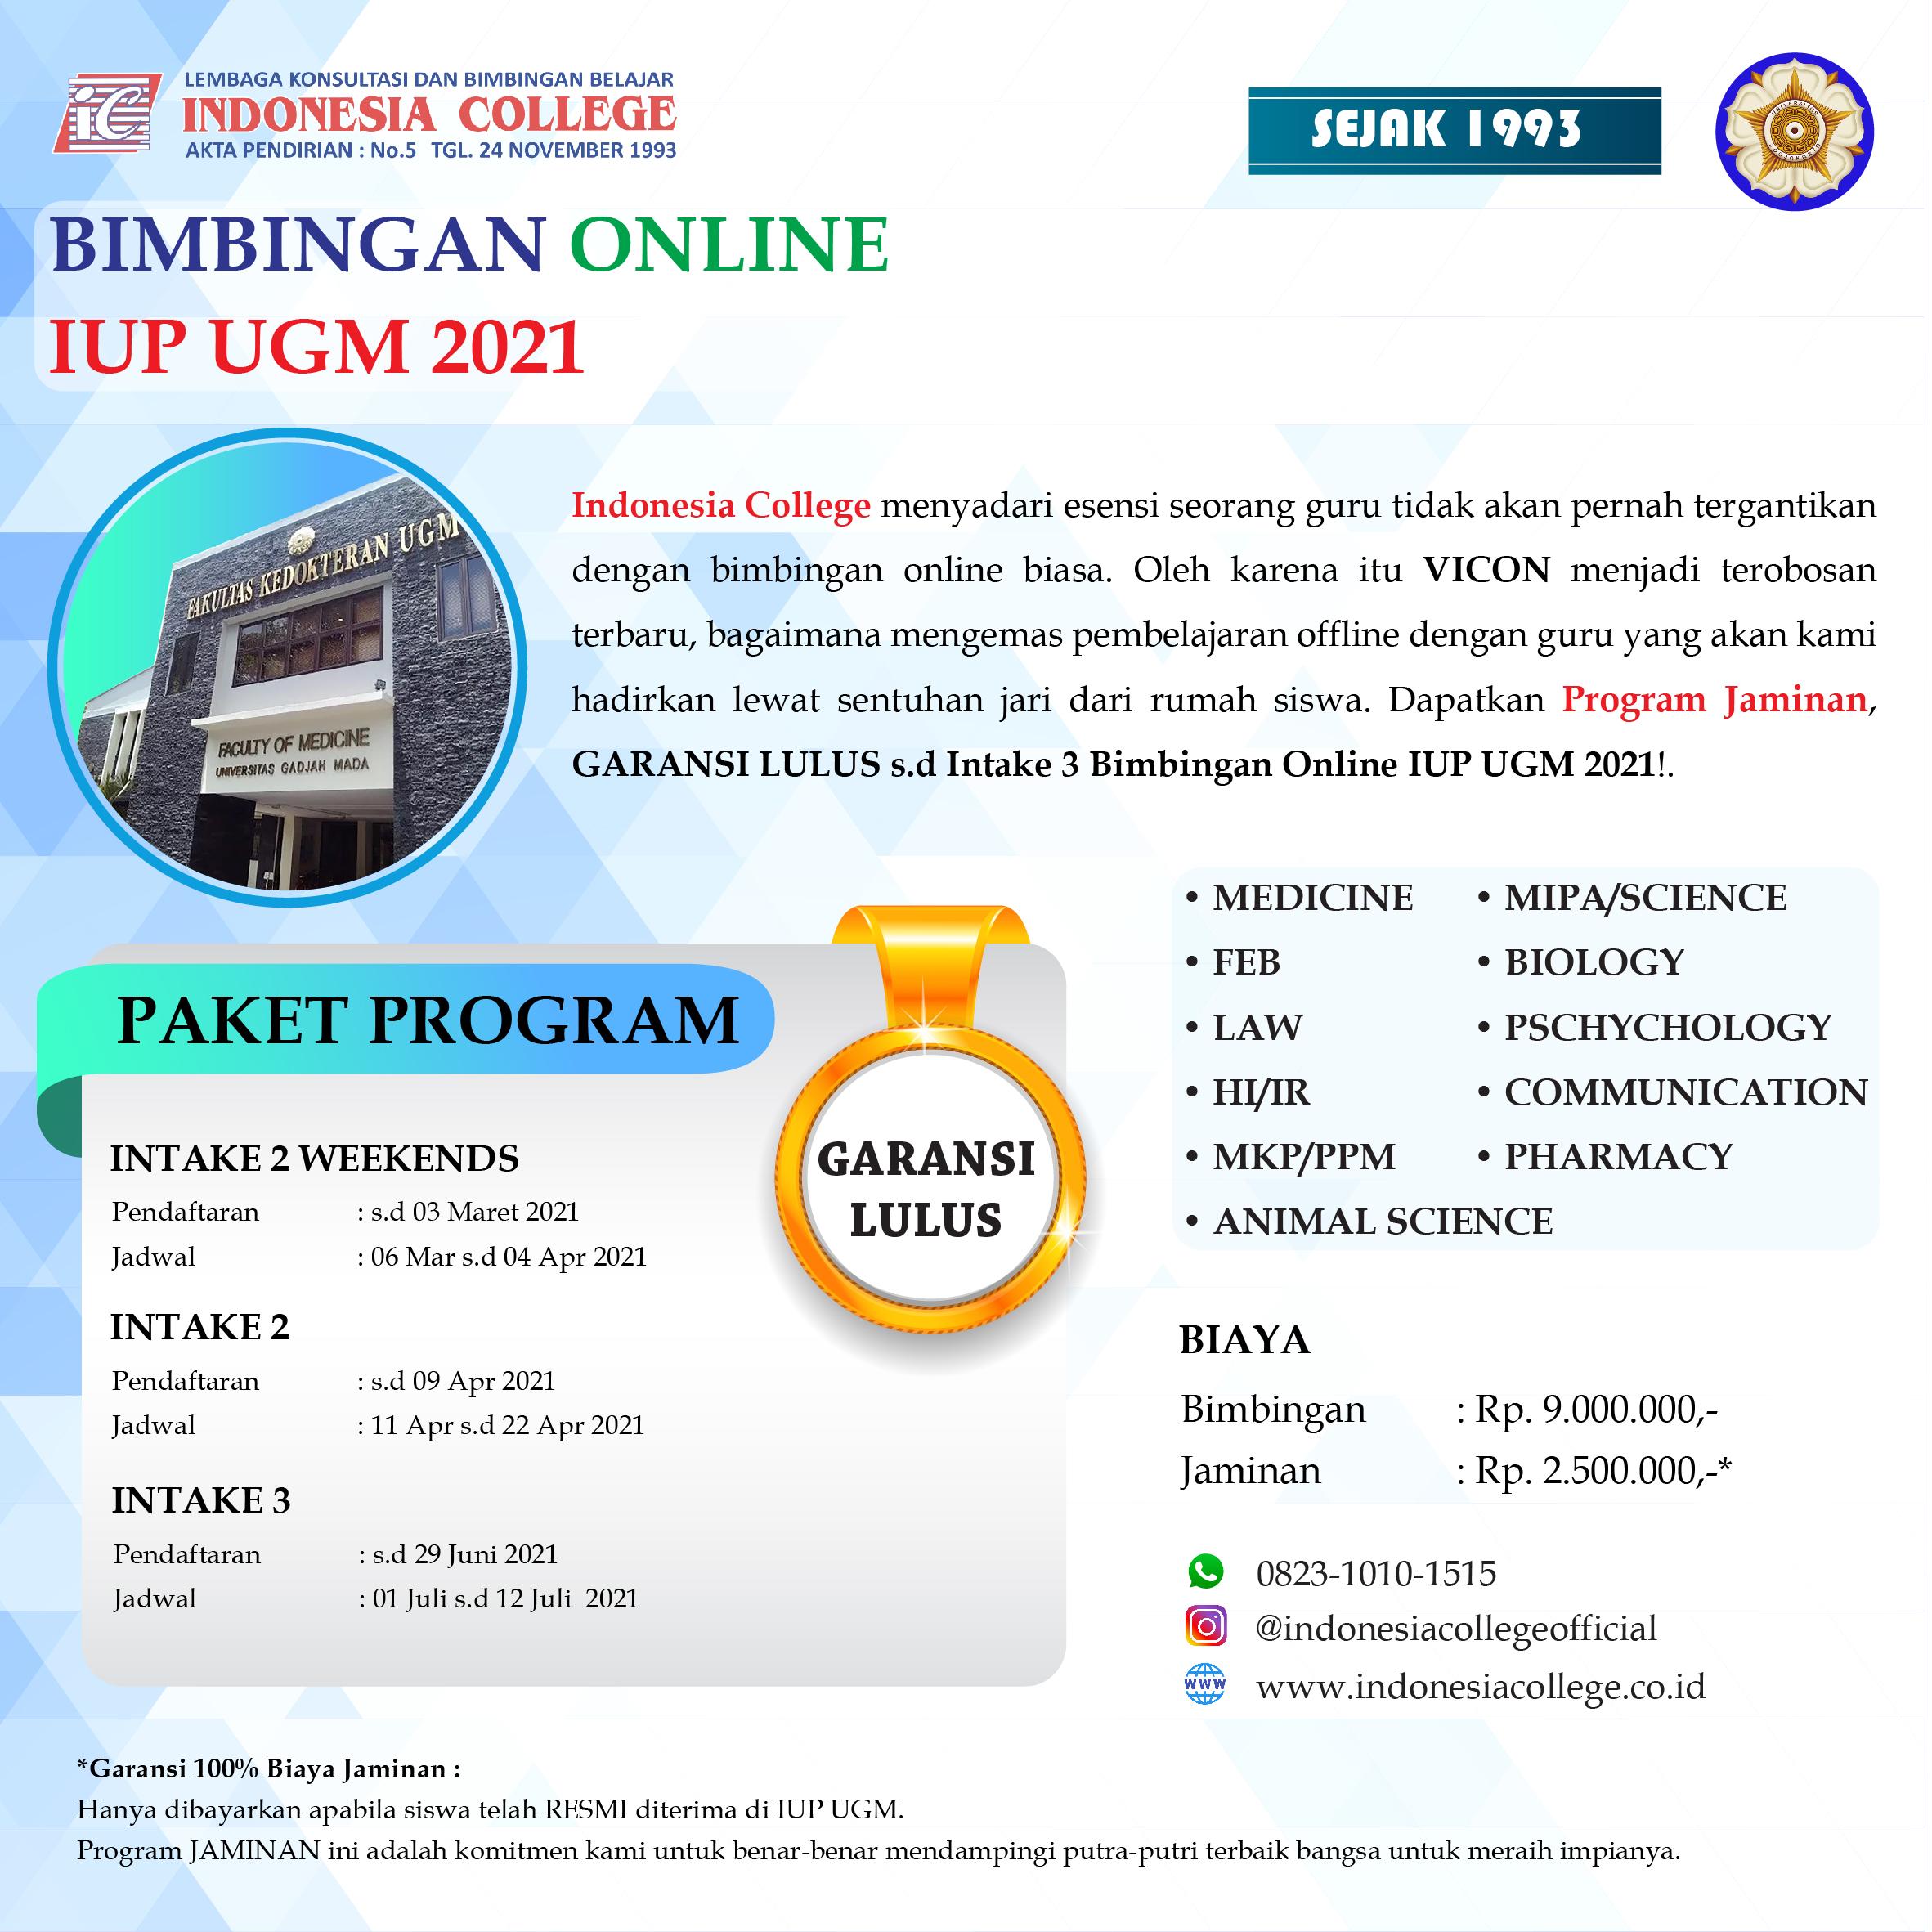 BIMBEL IUP UGM ONLINE 2021